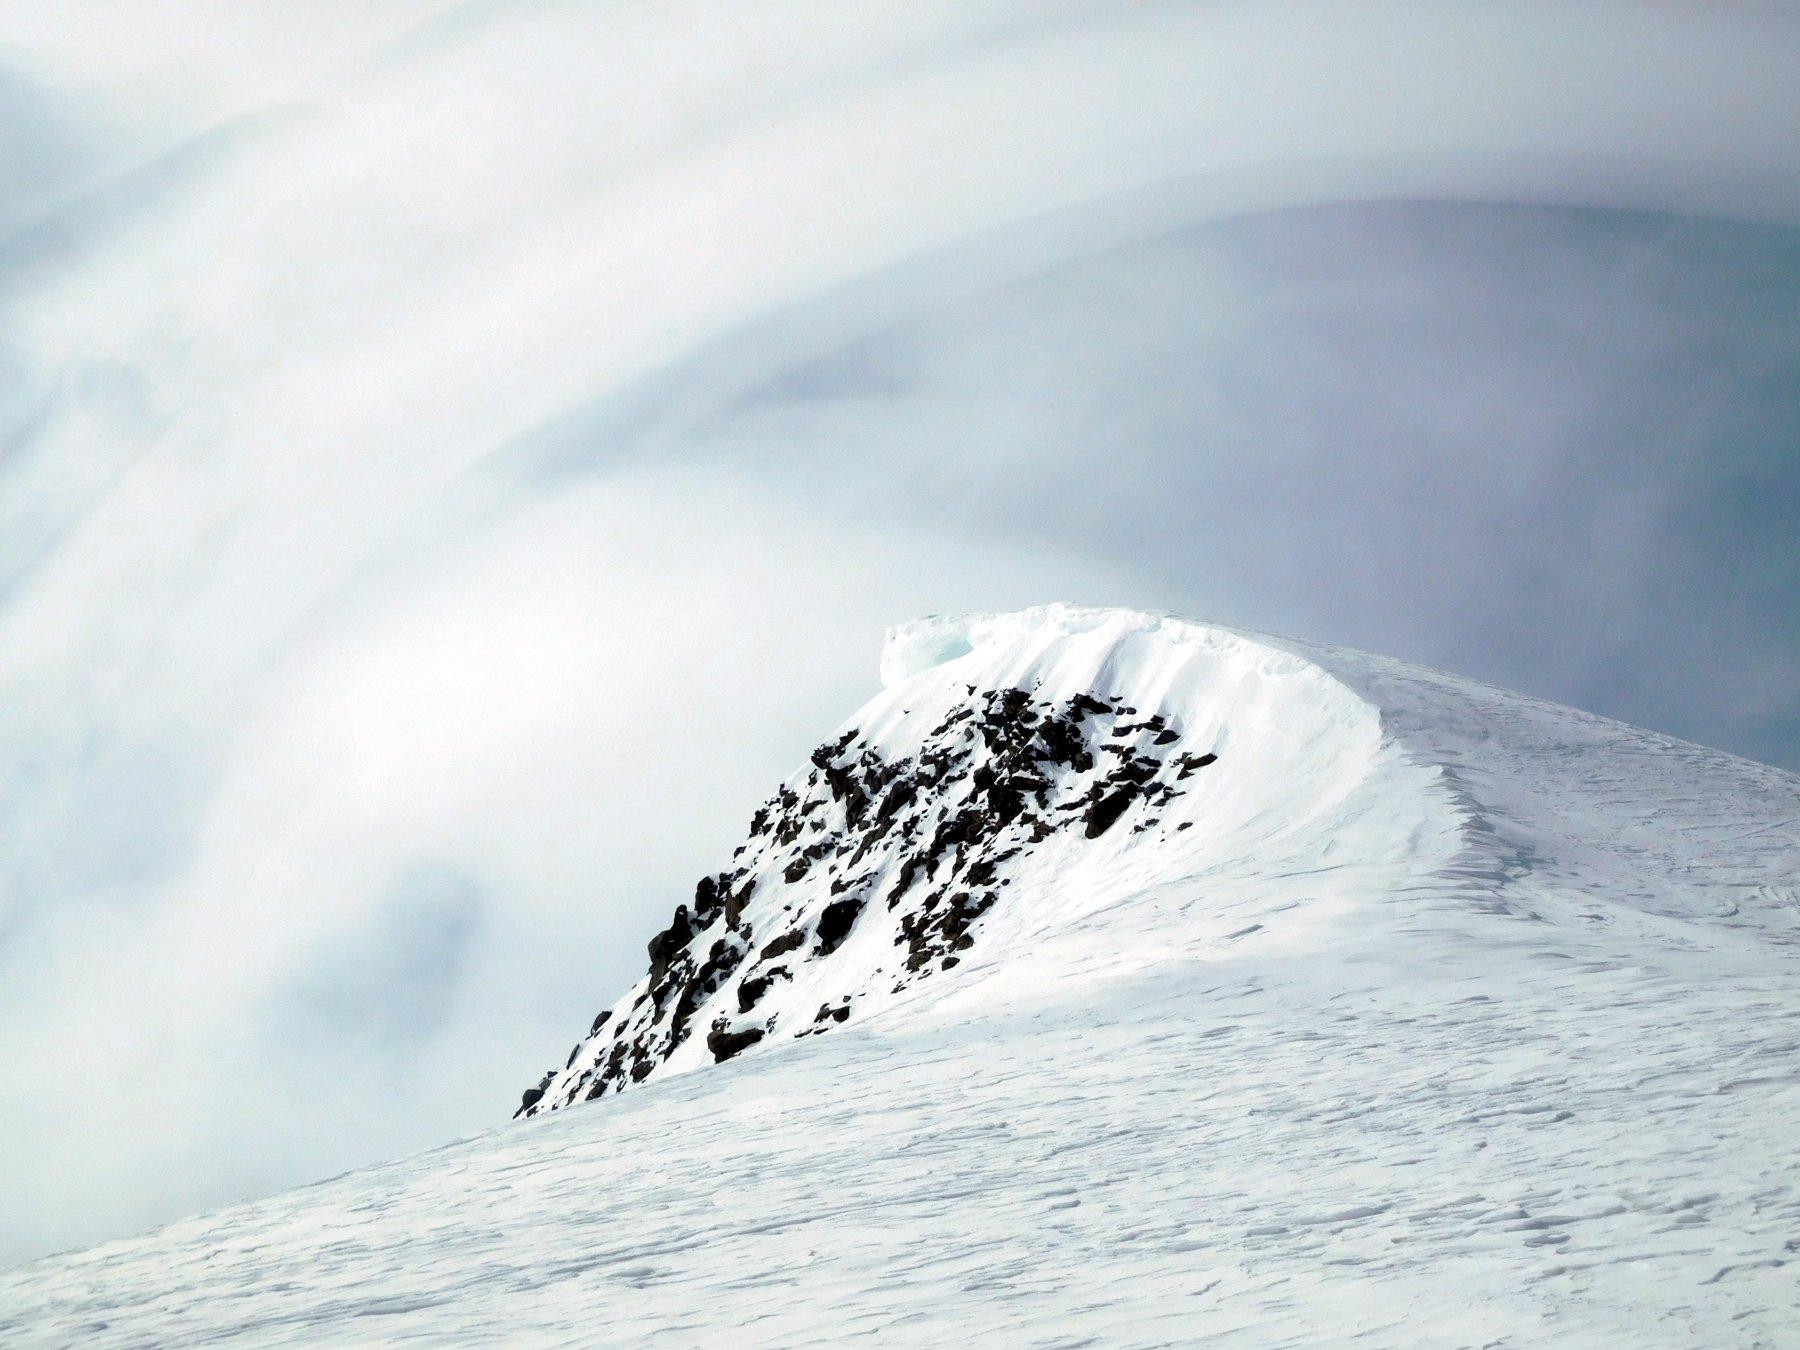 D2 nubi da vento sul Dome de l'Arpont